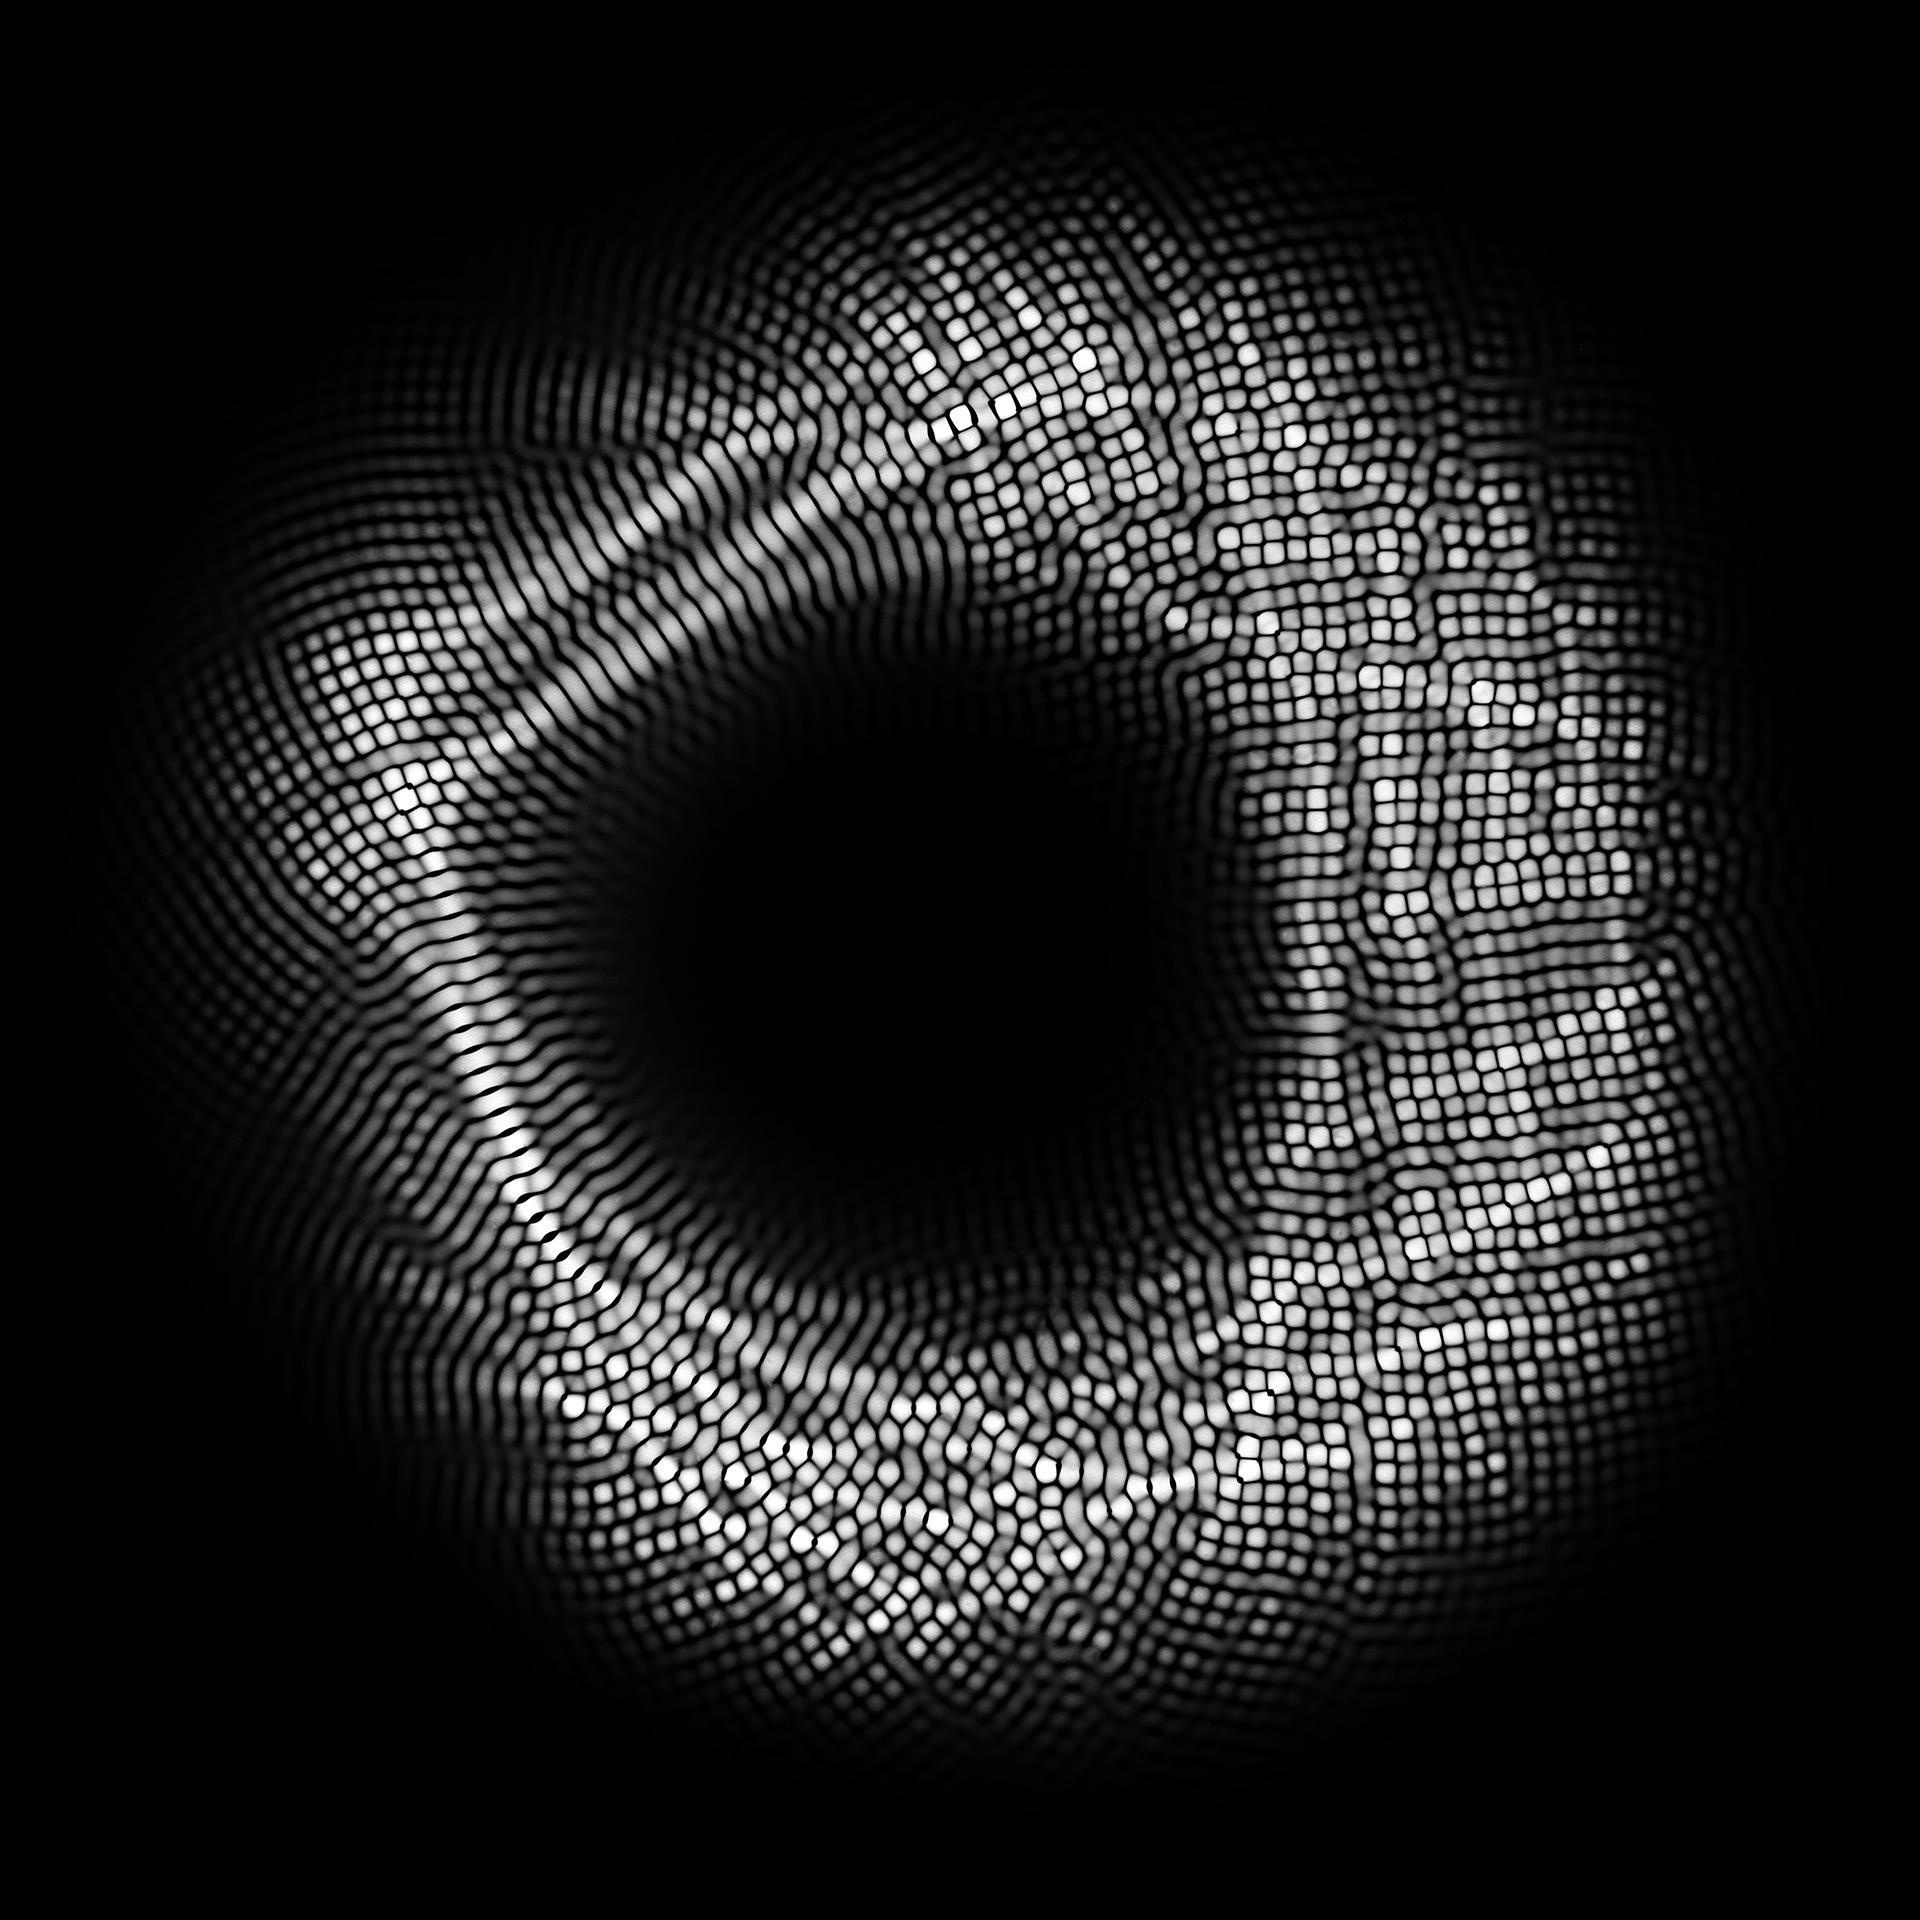 Photogramme sonore 407 hertz